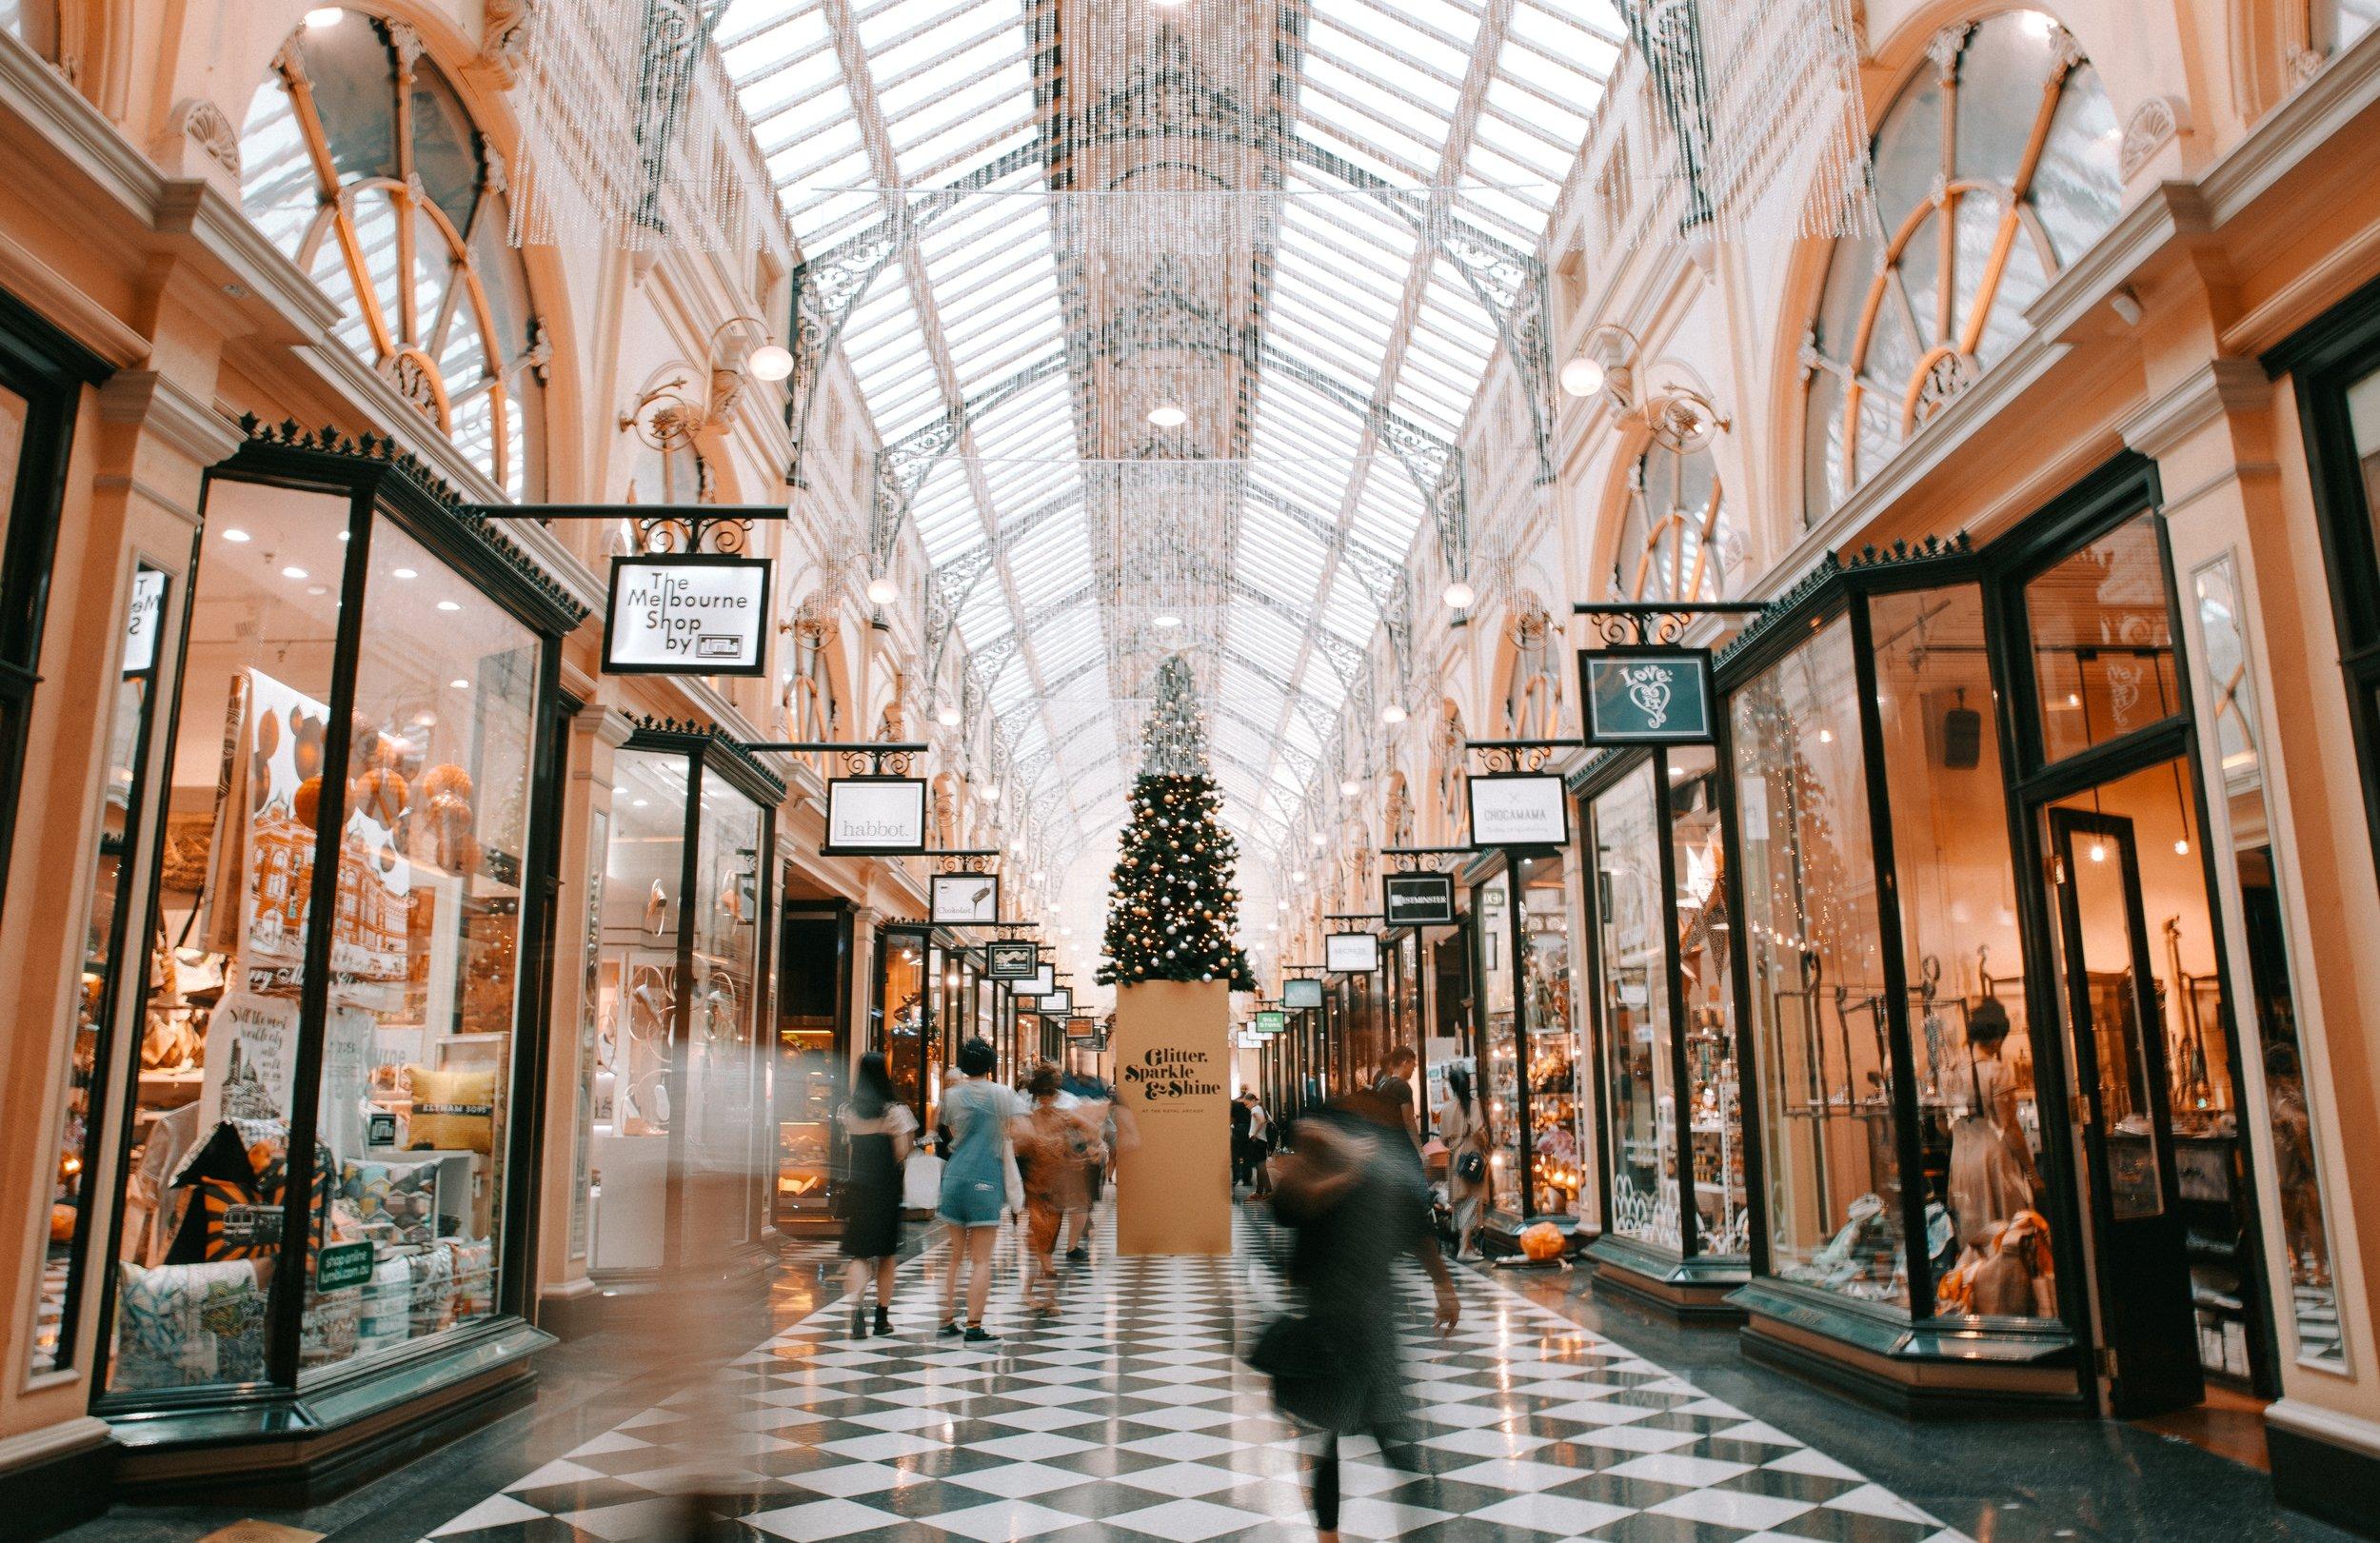 The Royal Arcade, Melbourne. Photo by Heidi Sandstrom